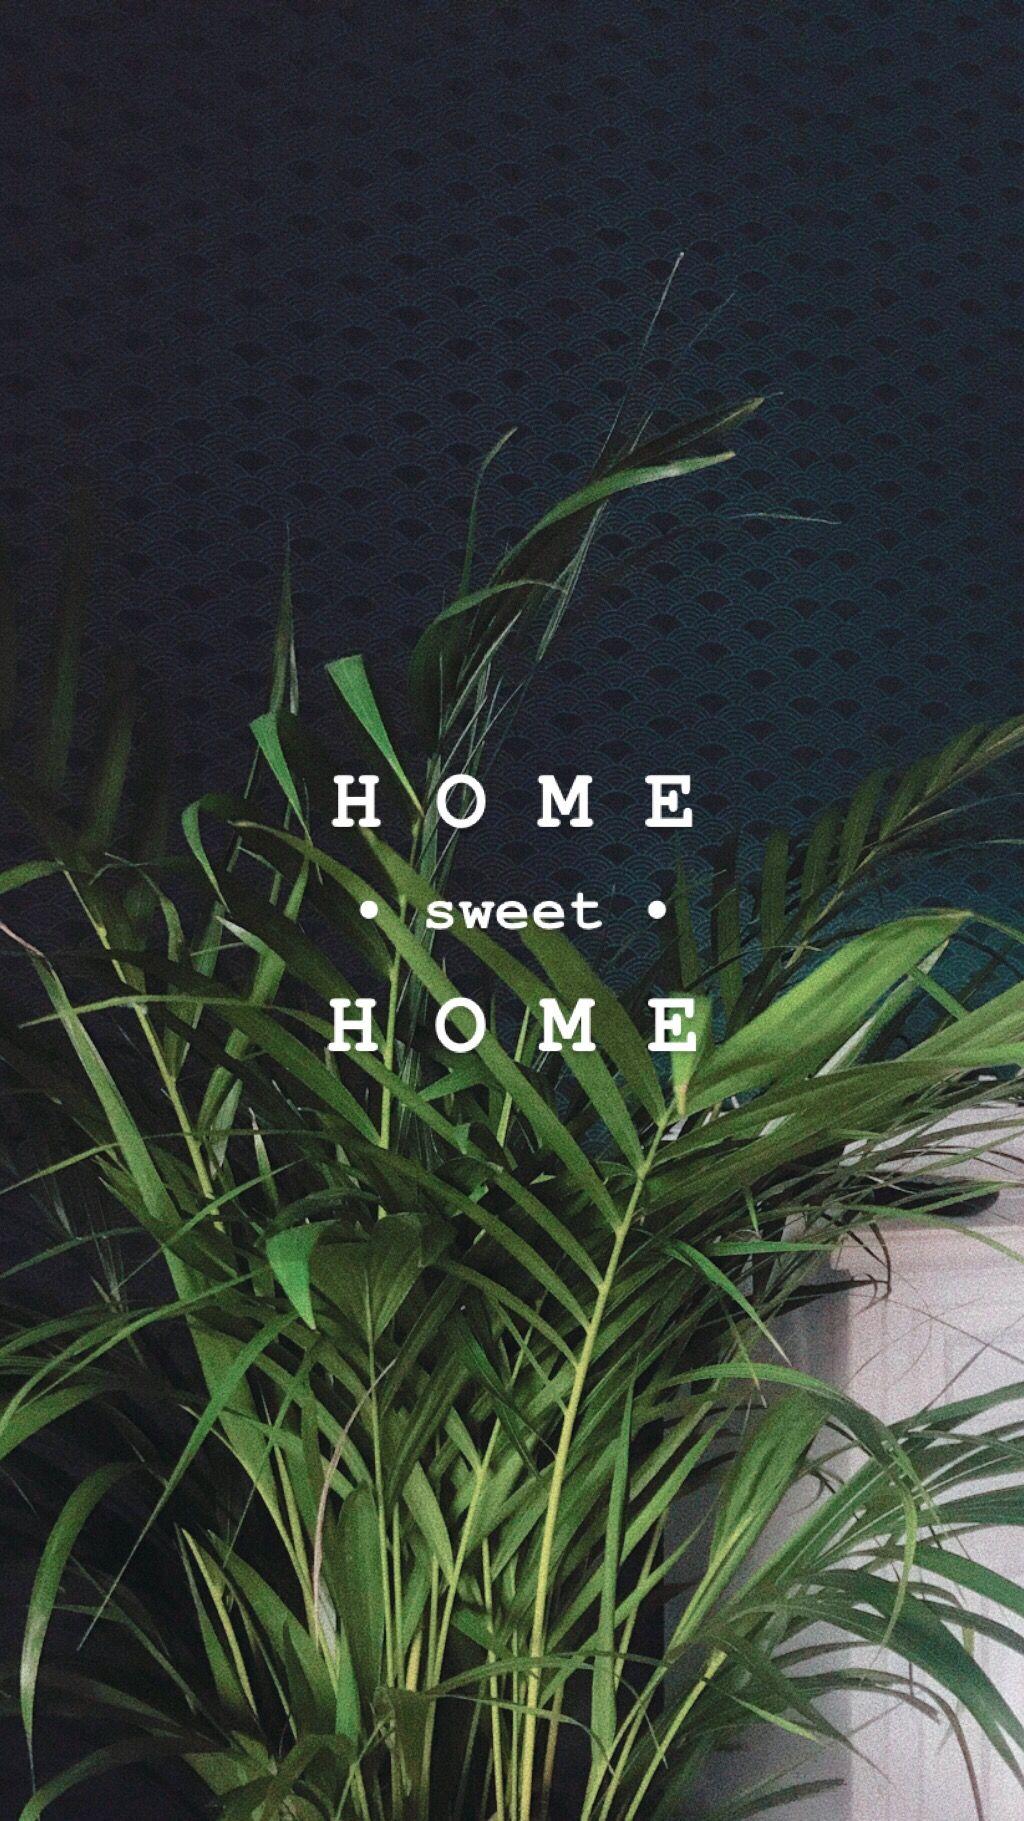 Best 12 plant story ideen ich Plants just Wanne be friends